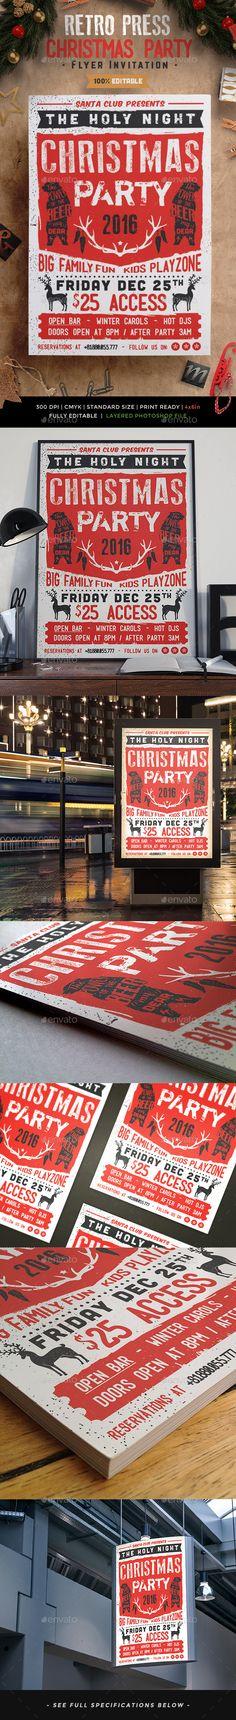 Retro Press Christmas Flyer Invitation Template PSD #design Download: http://graphicriver.net/item/retro-press-christmas-flyer-invitation/13587145?ref=ksioks